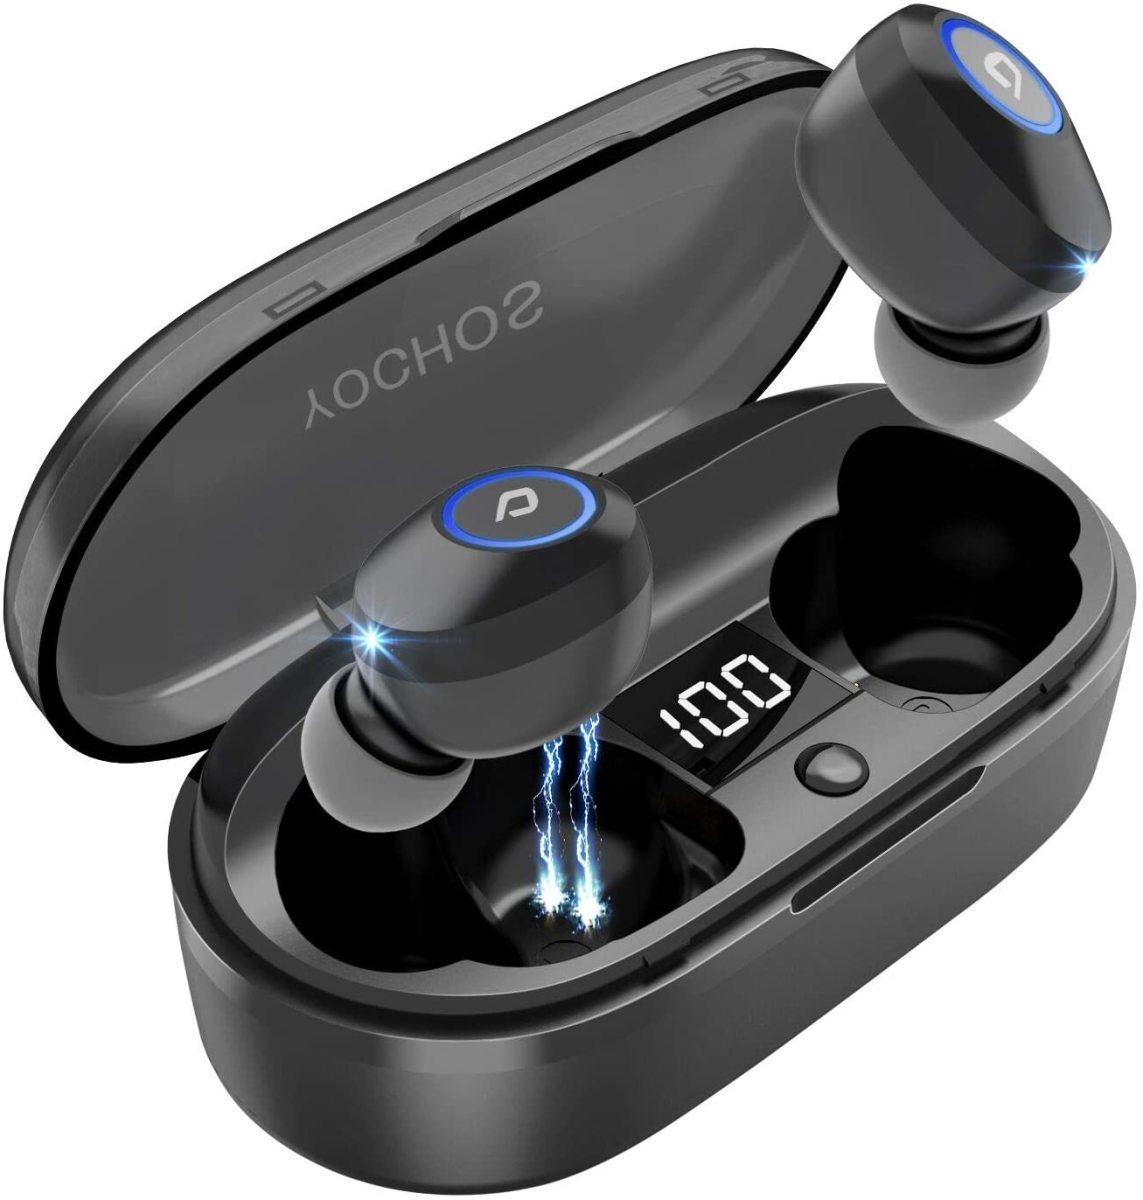 Yochos True Wireless Bluetooth 5.0 Earbuds